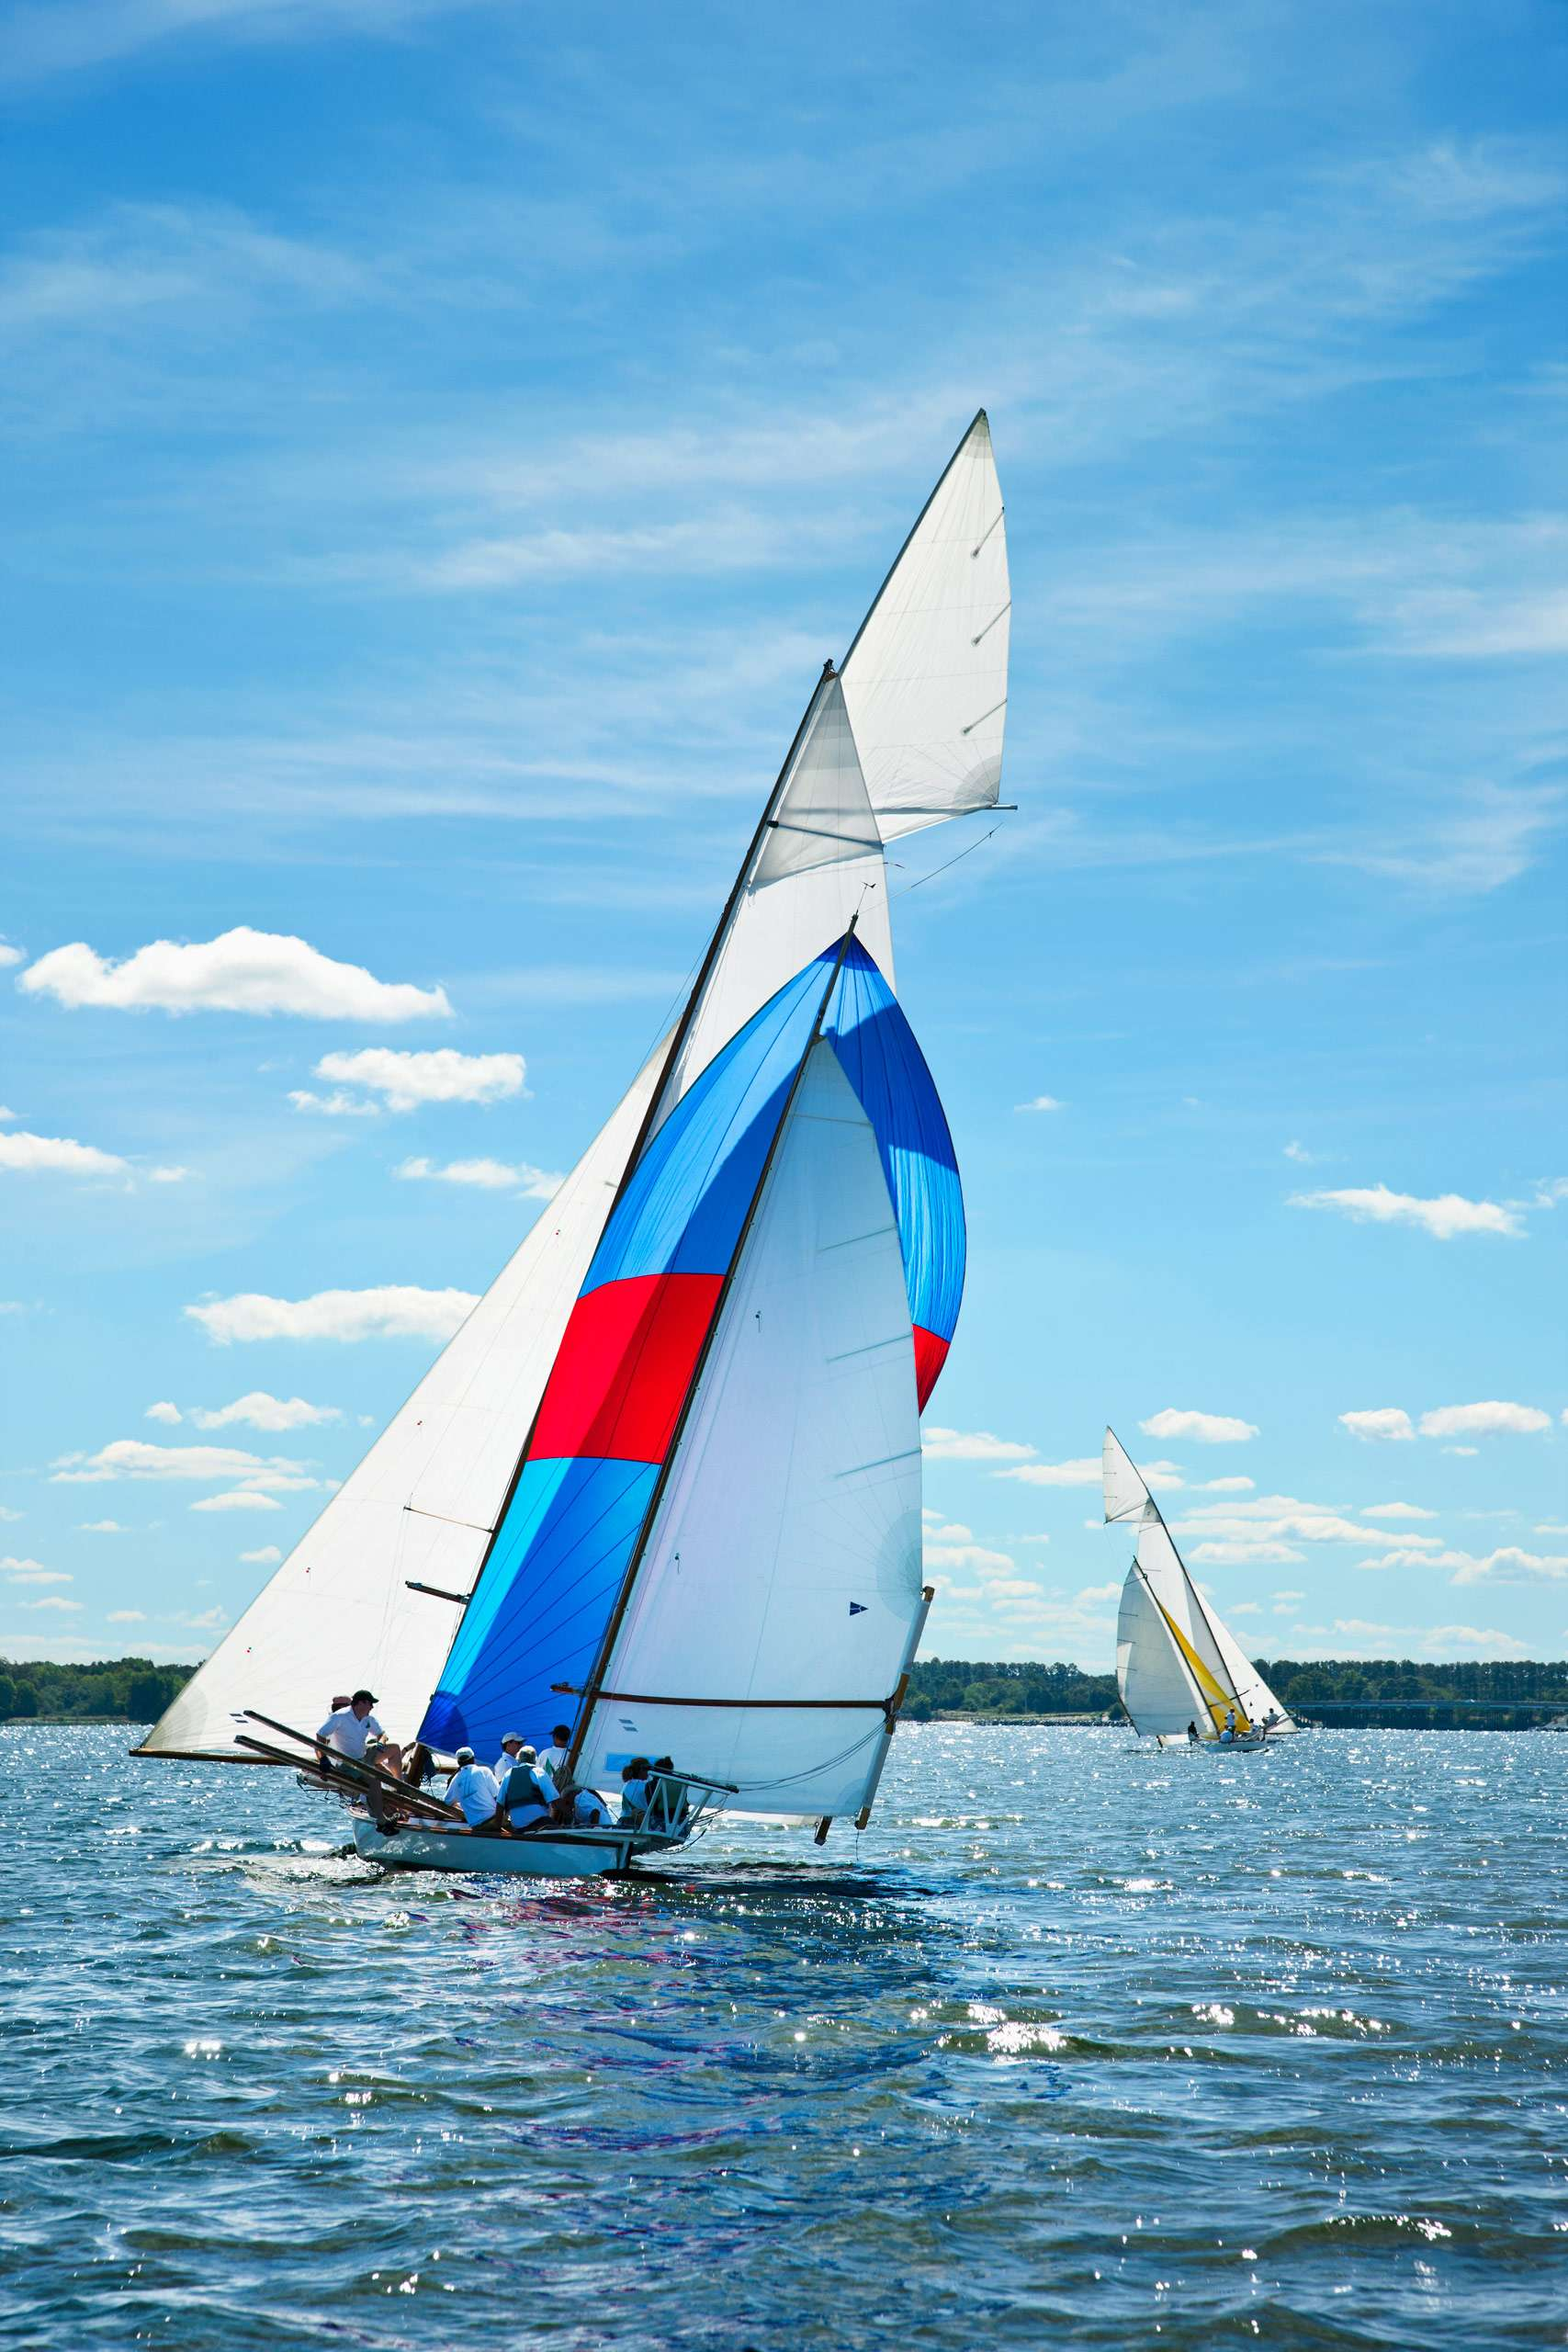 PORTFOLIO - Sailing - Log Canoes #22   PCG582